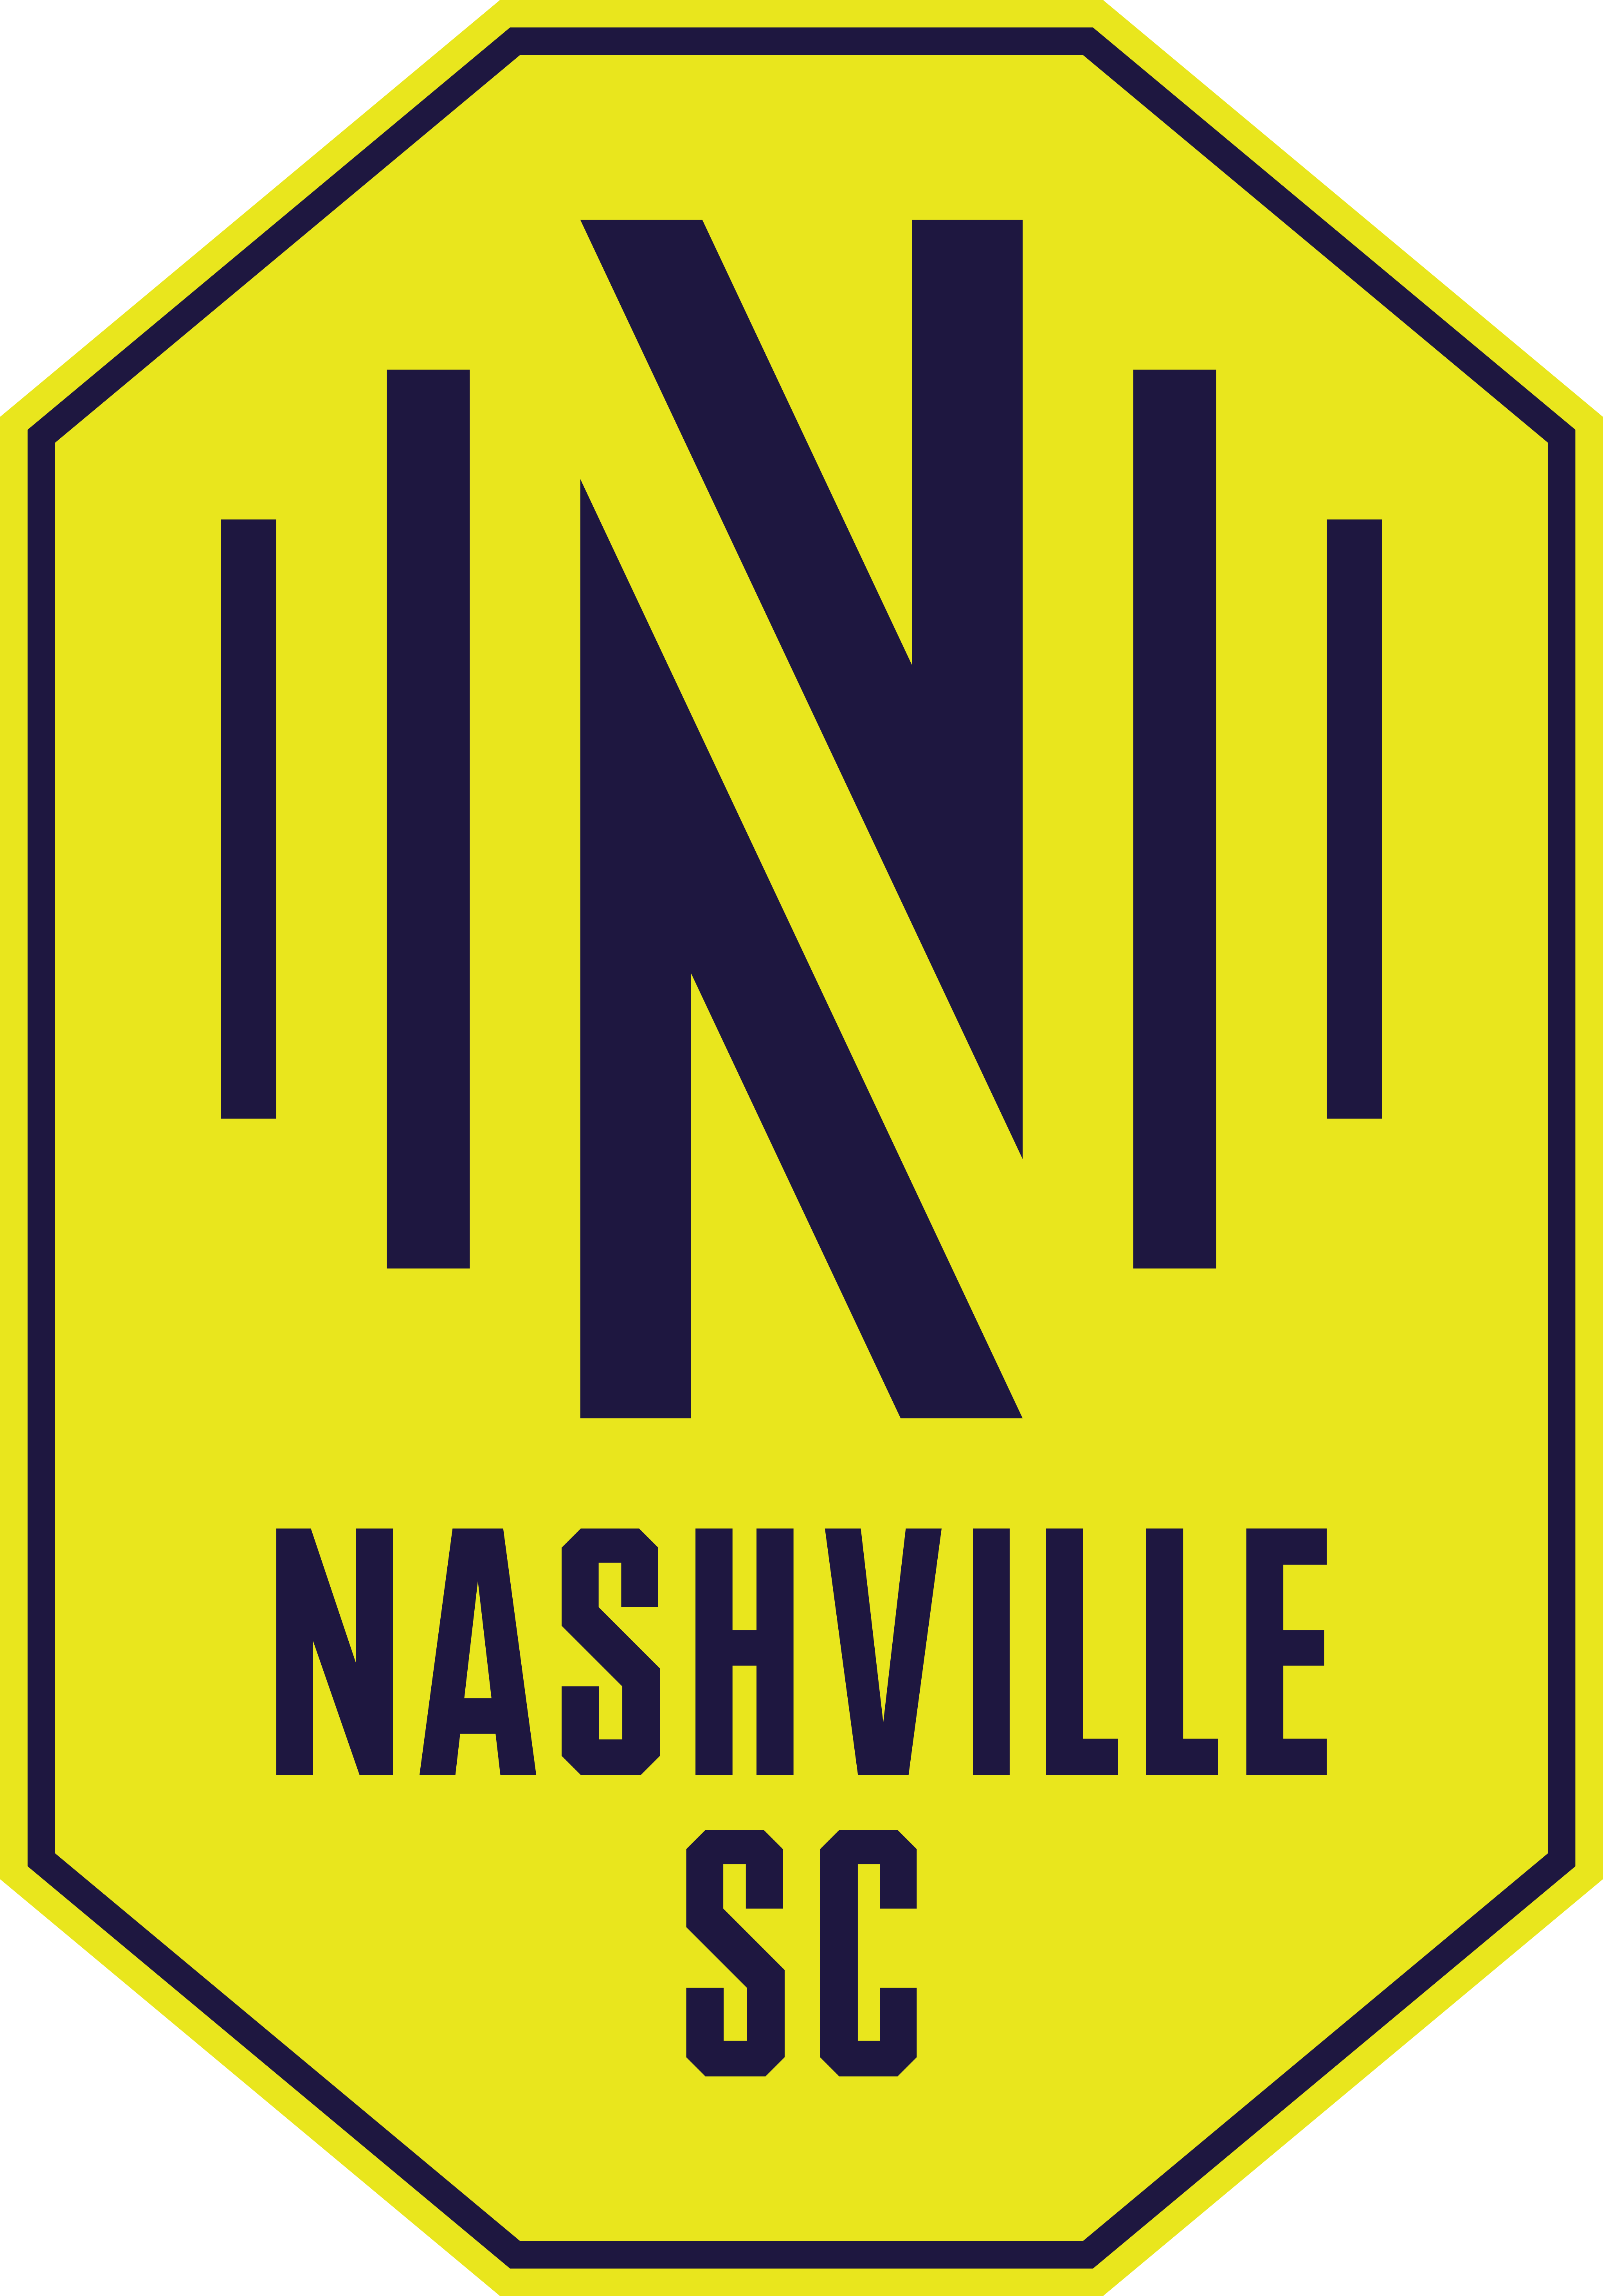 Nashville Soccer Club logo.